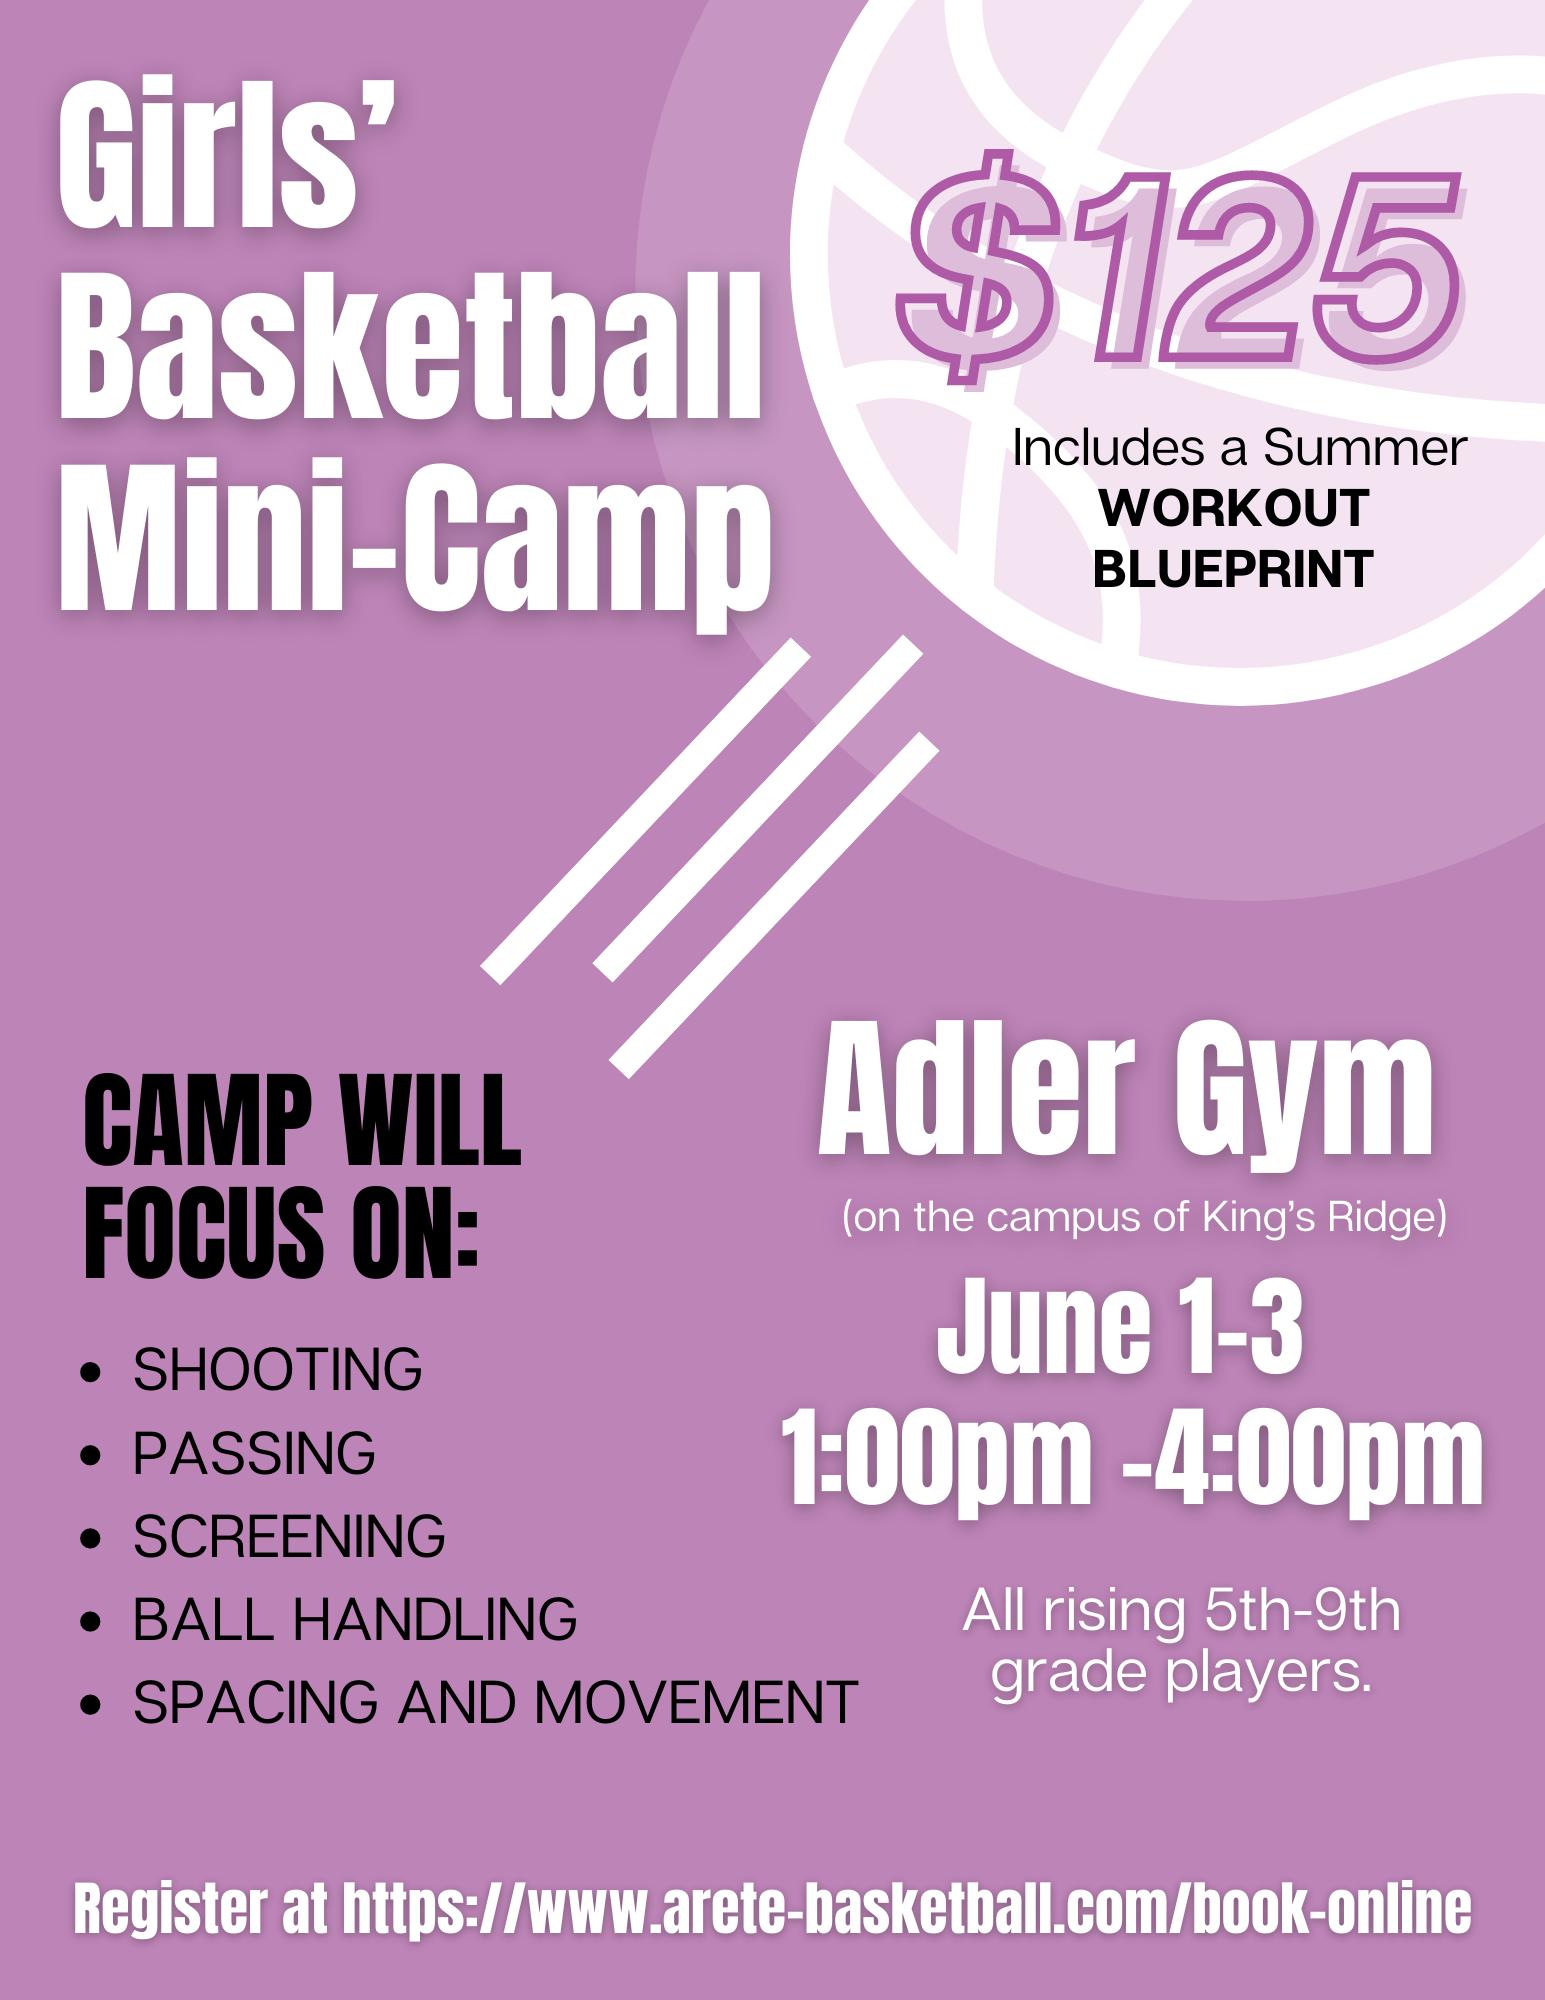 Girls' Basketball Mini-Camp